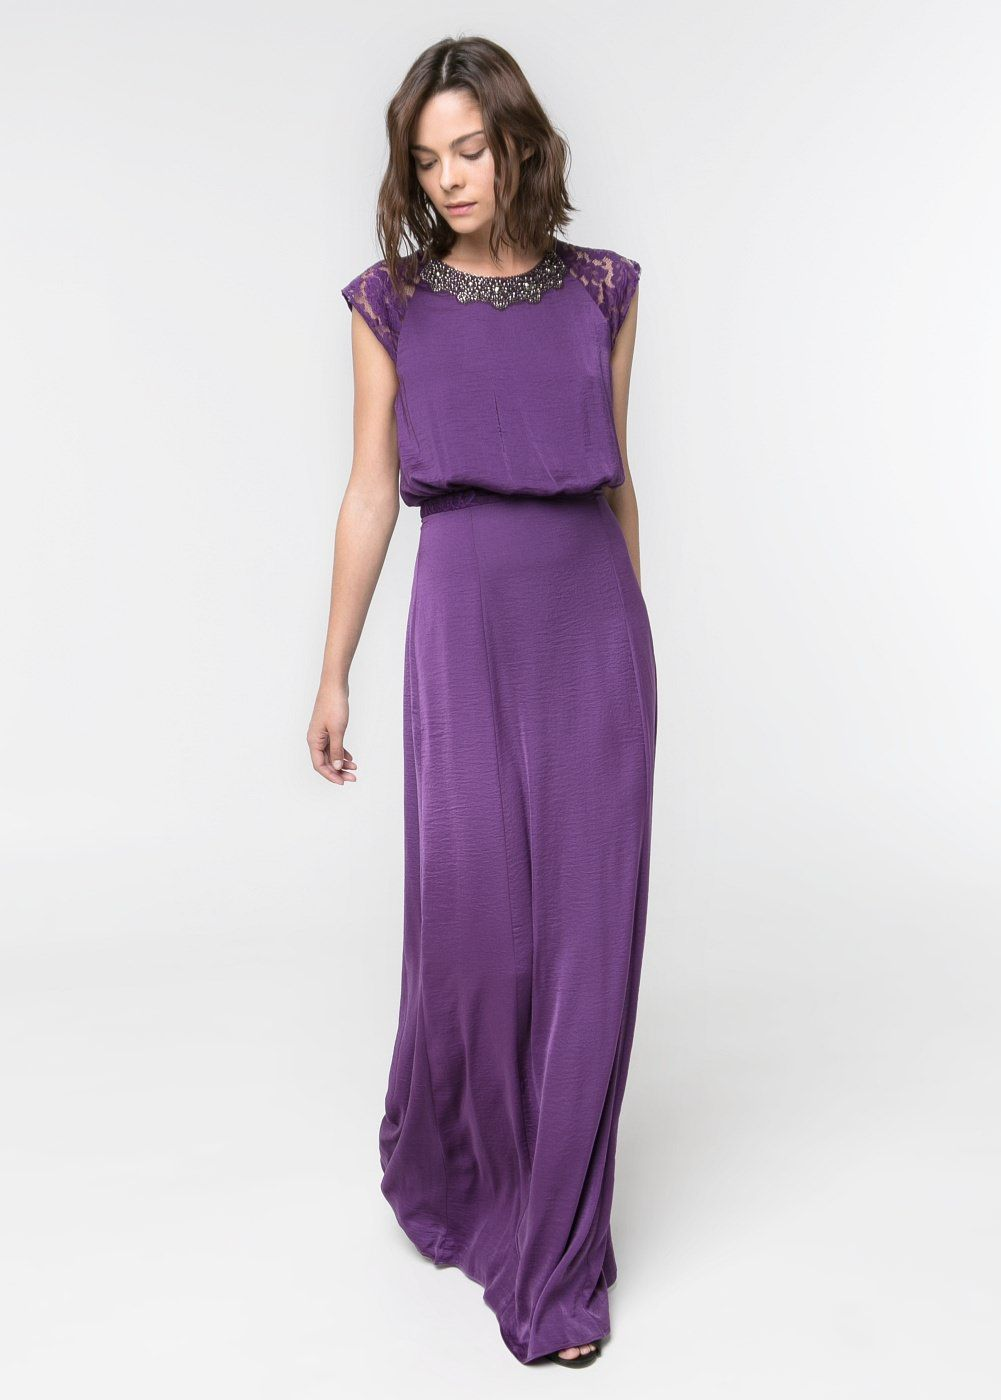 Vestido largo abalorios - Mujer | Pinterest | Abalorios, Vestiditos ...